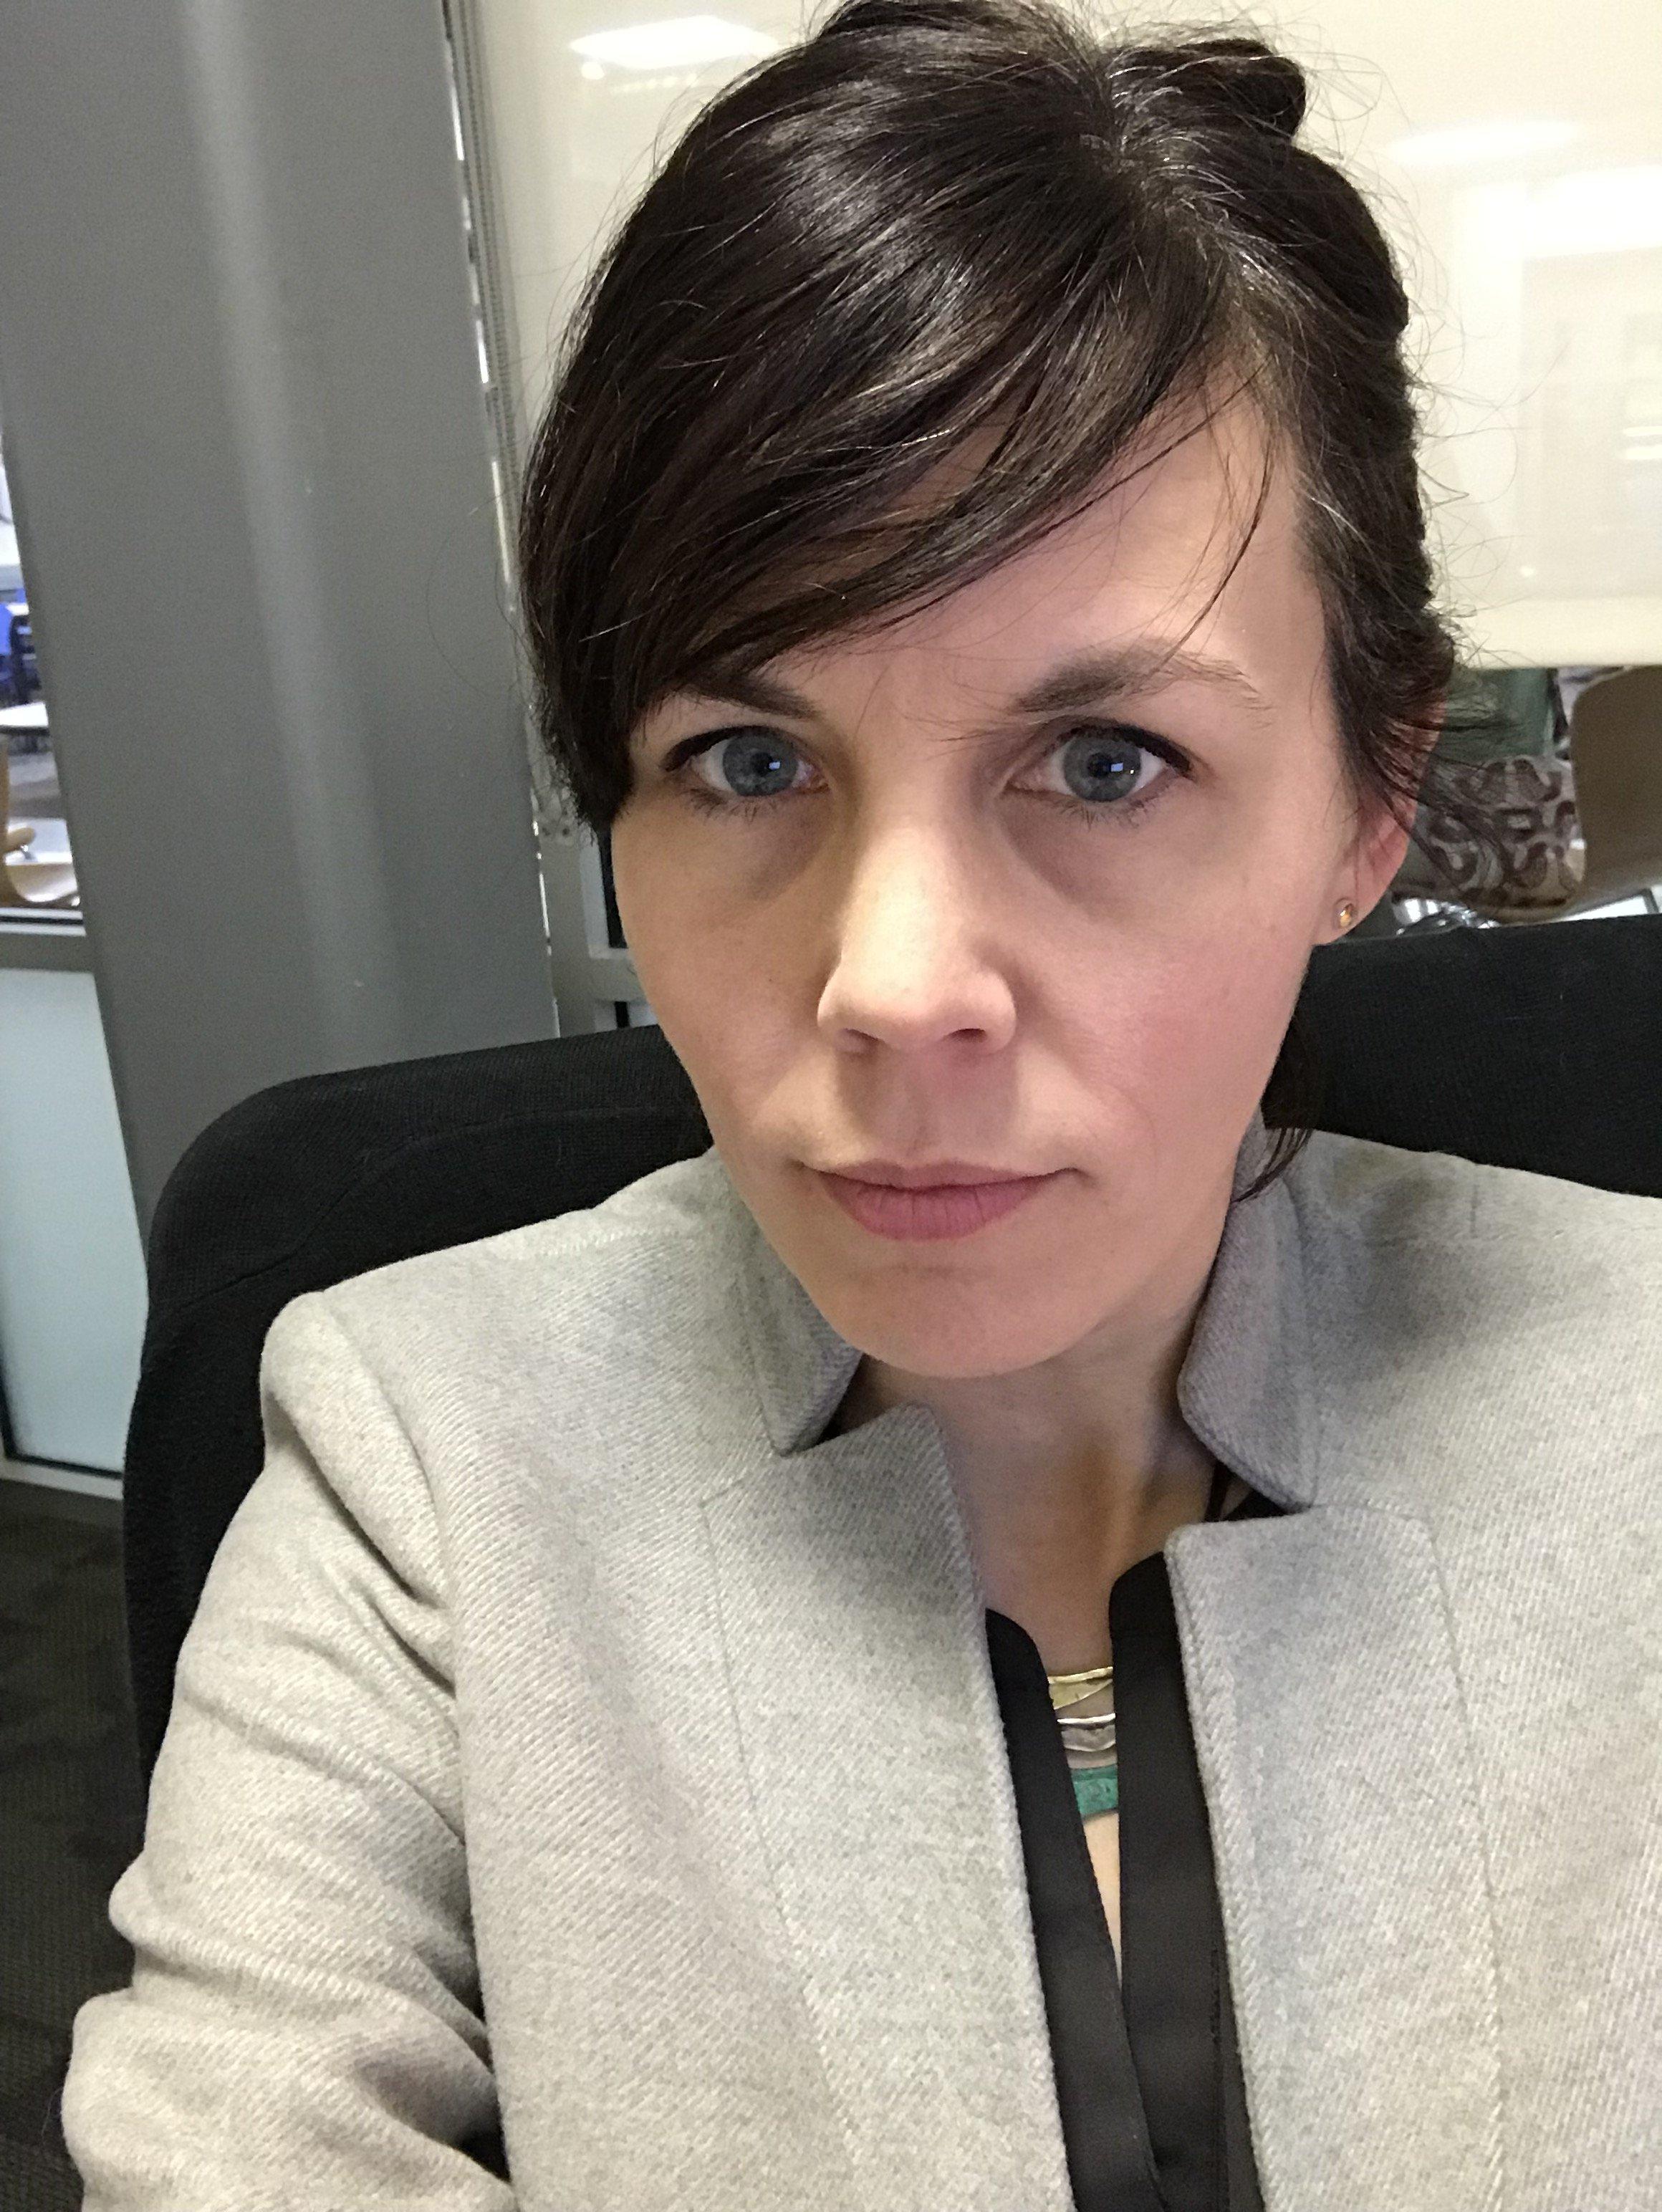 Erin Post